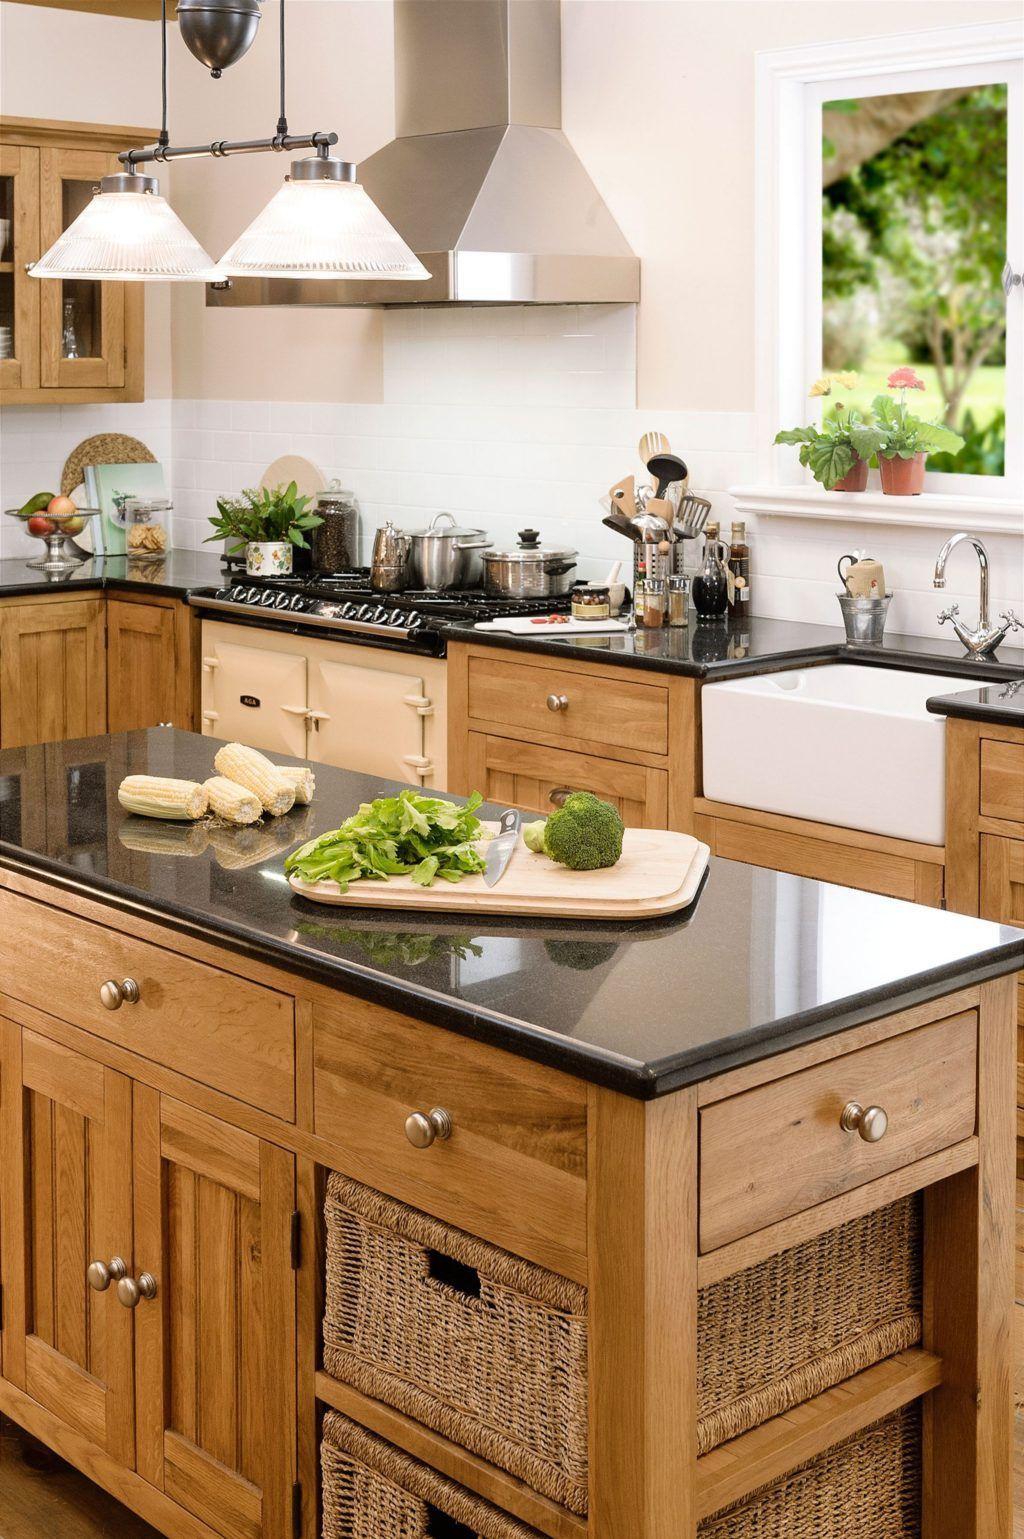 25+ Charming Kitchen Cabinet Decorating Ideas Using Oak ... on Maple Cabinet Kitchen Ideas  id=47202